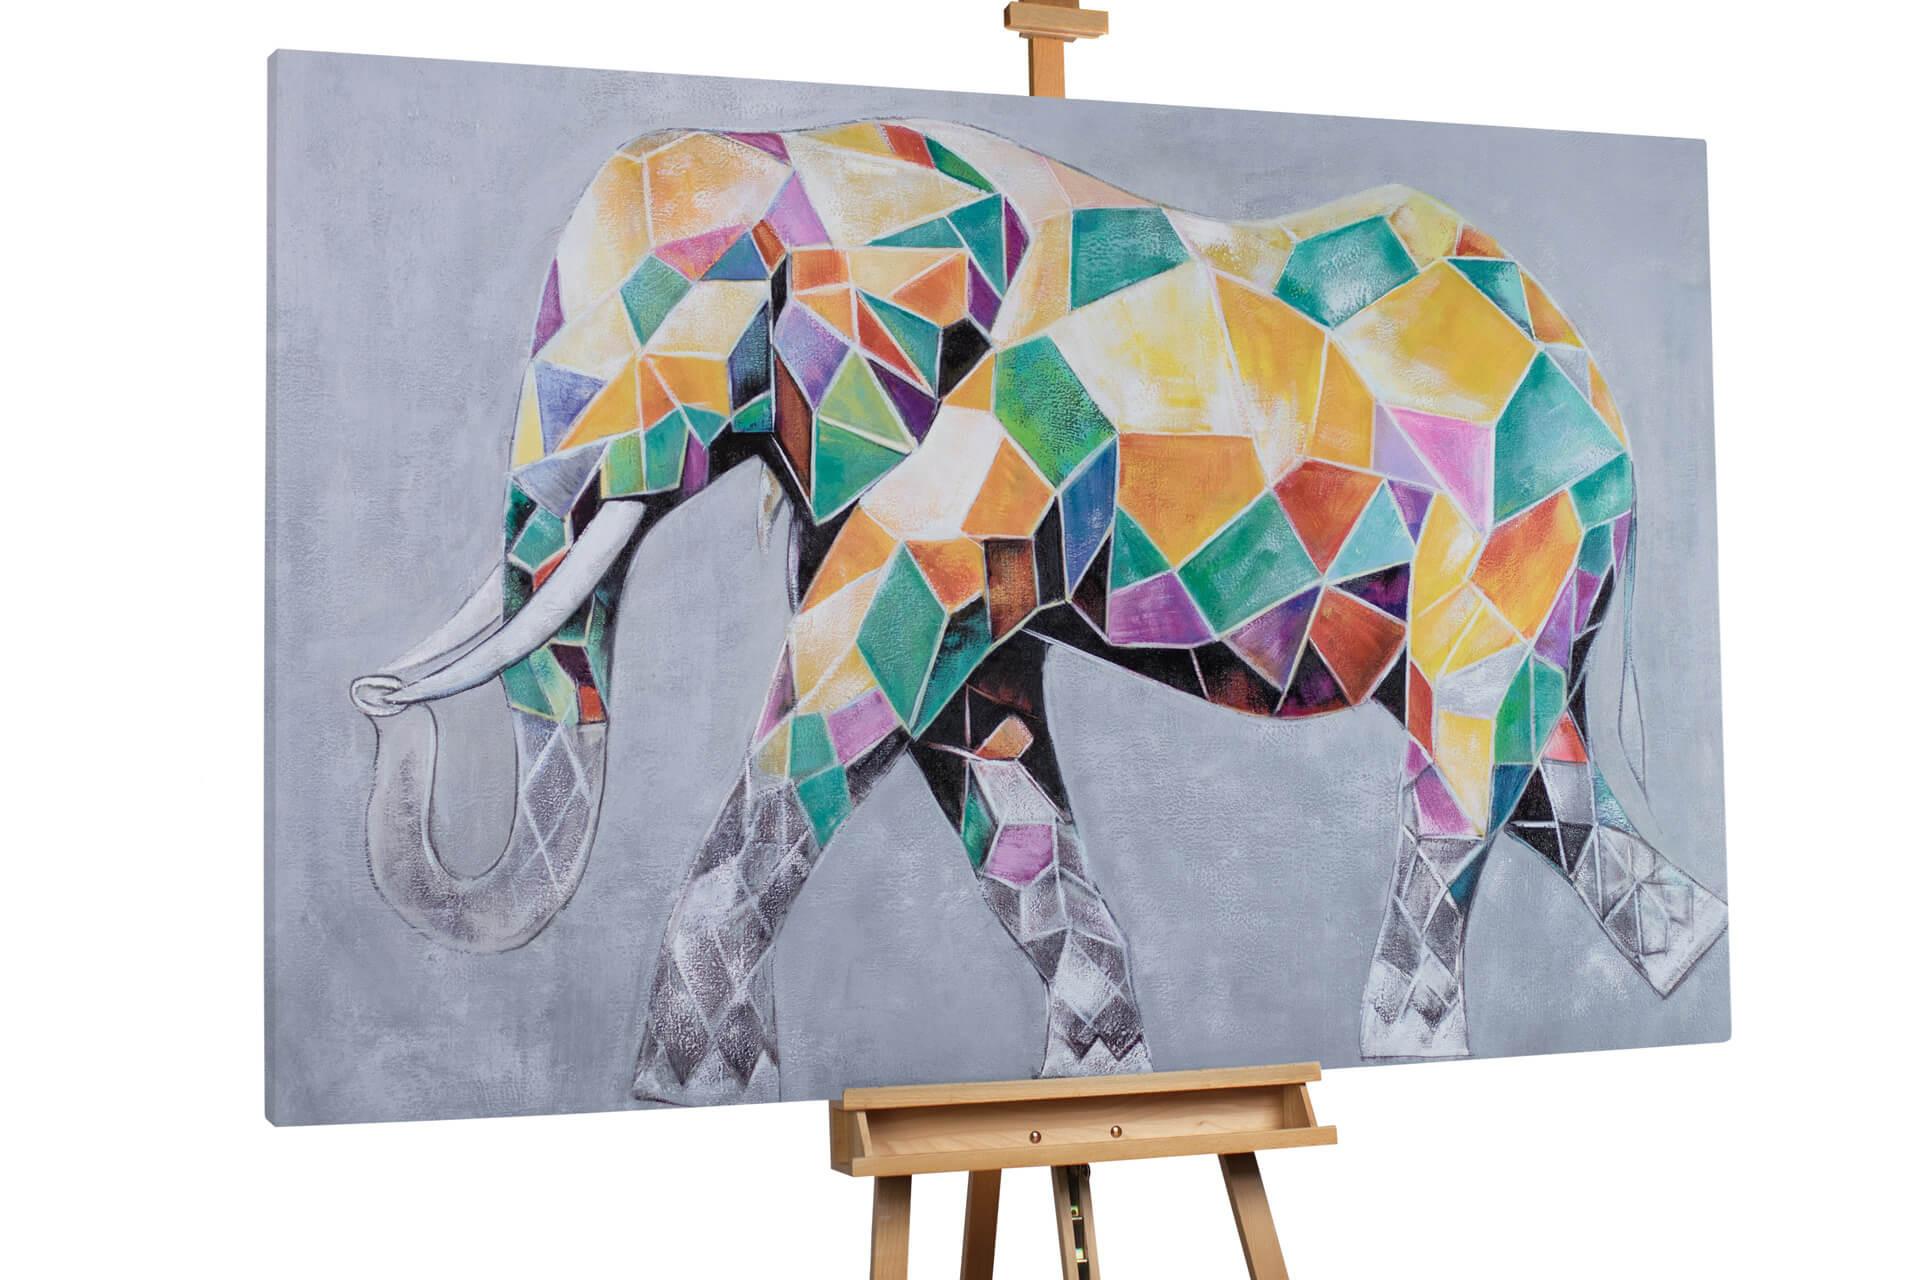 Elefant Zum Ausdrucken Neu Xxl Gemälde –l Elefant Bunt Kaufen Fotografieren